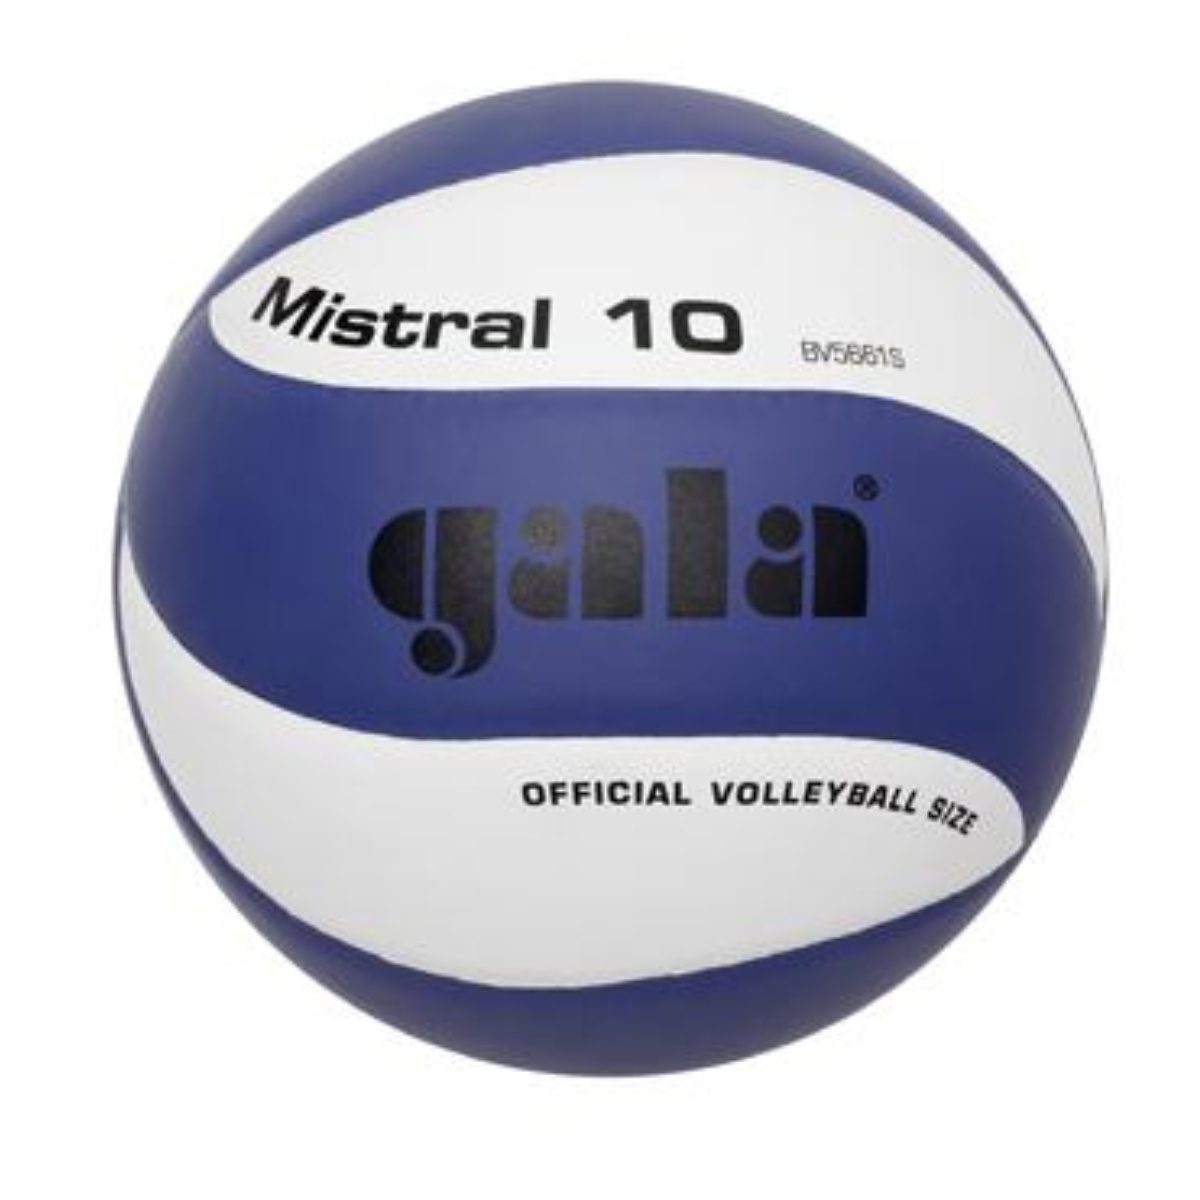 Volejbalový míč GALA Mistral BV5661